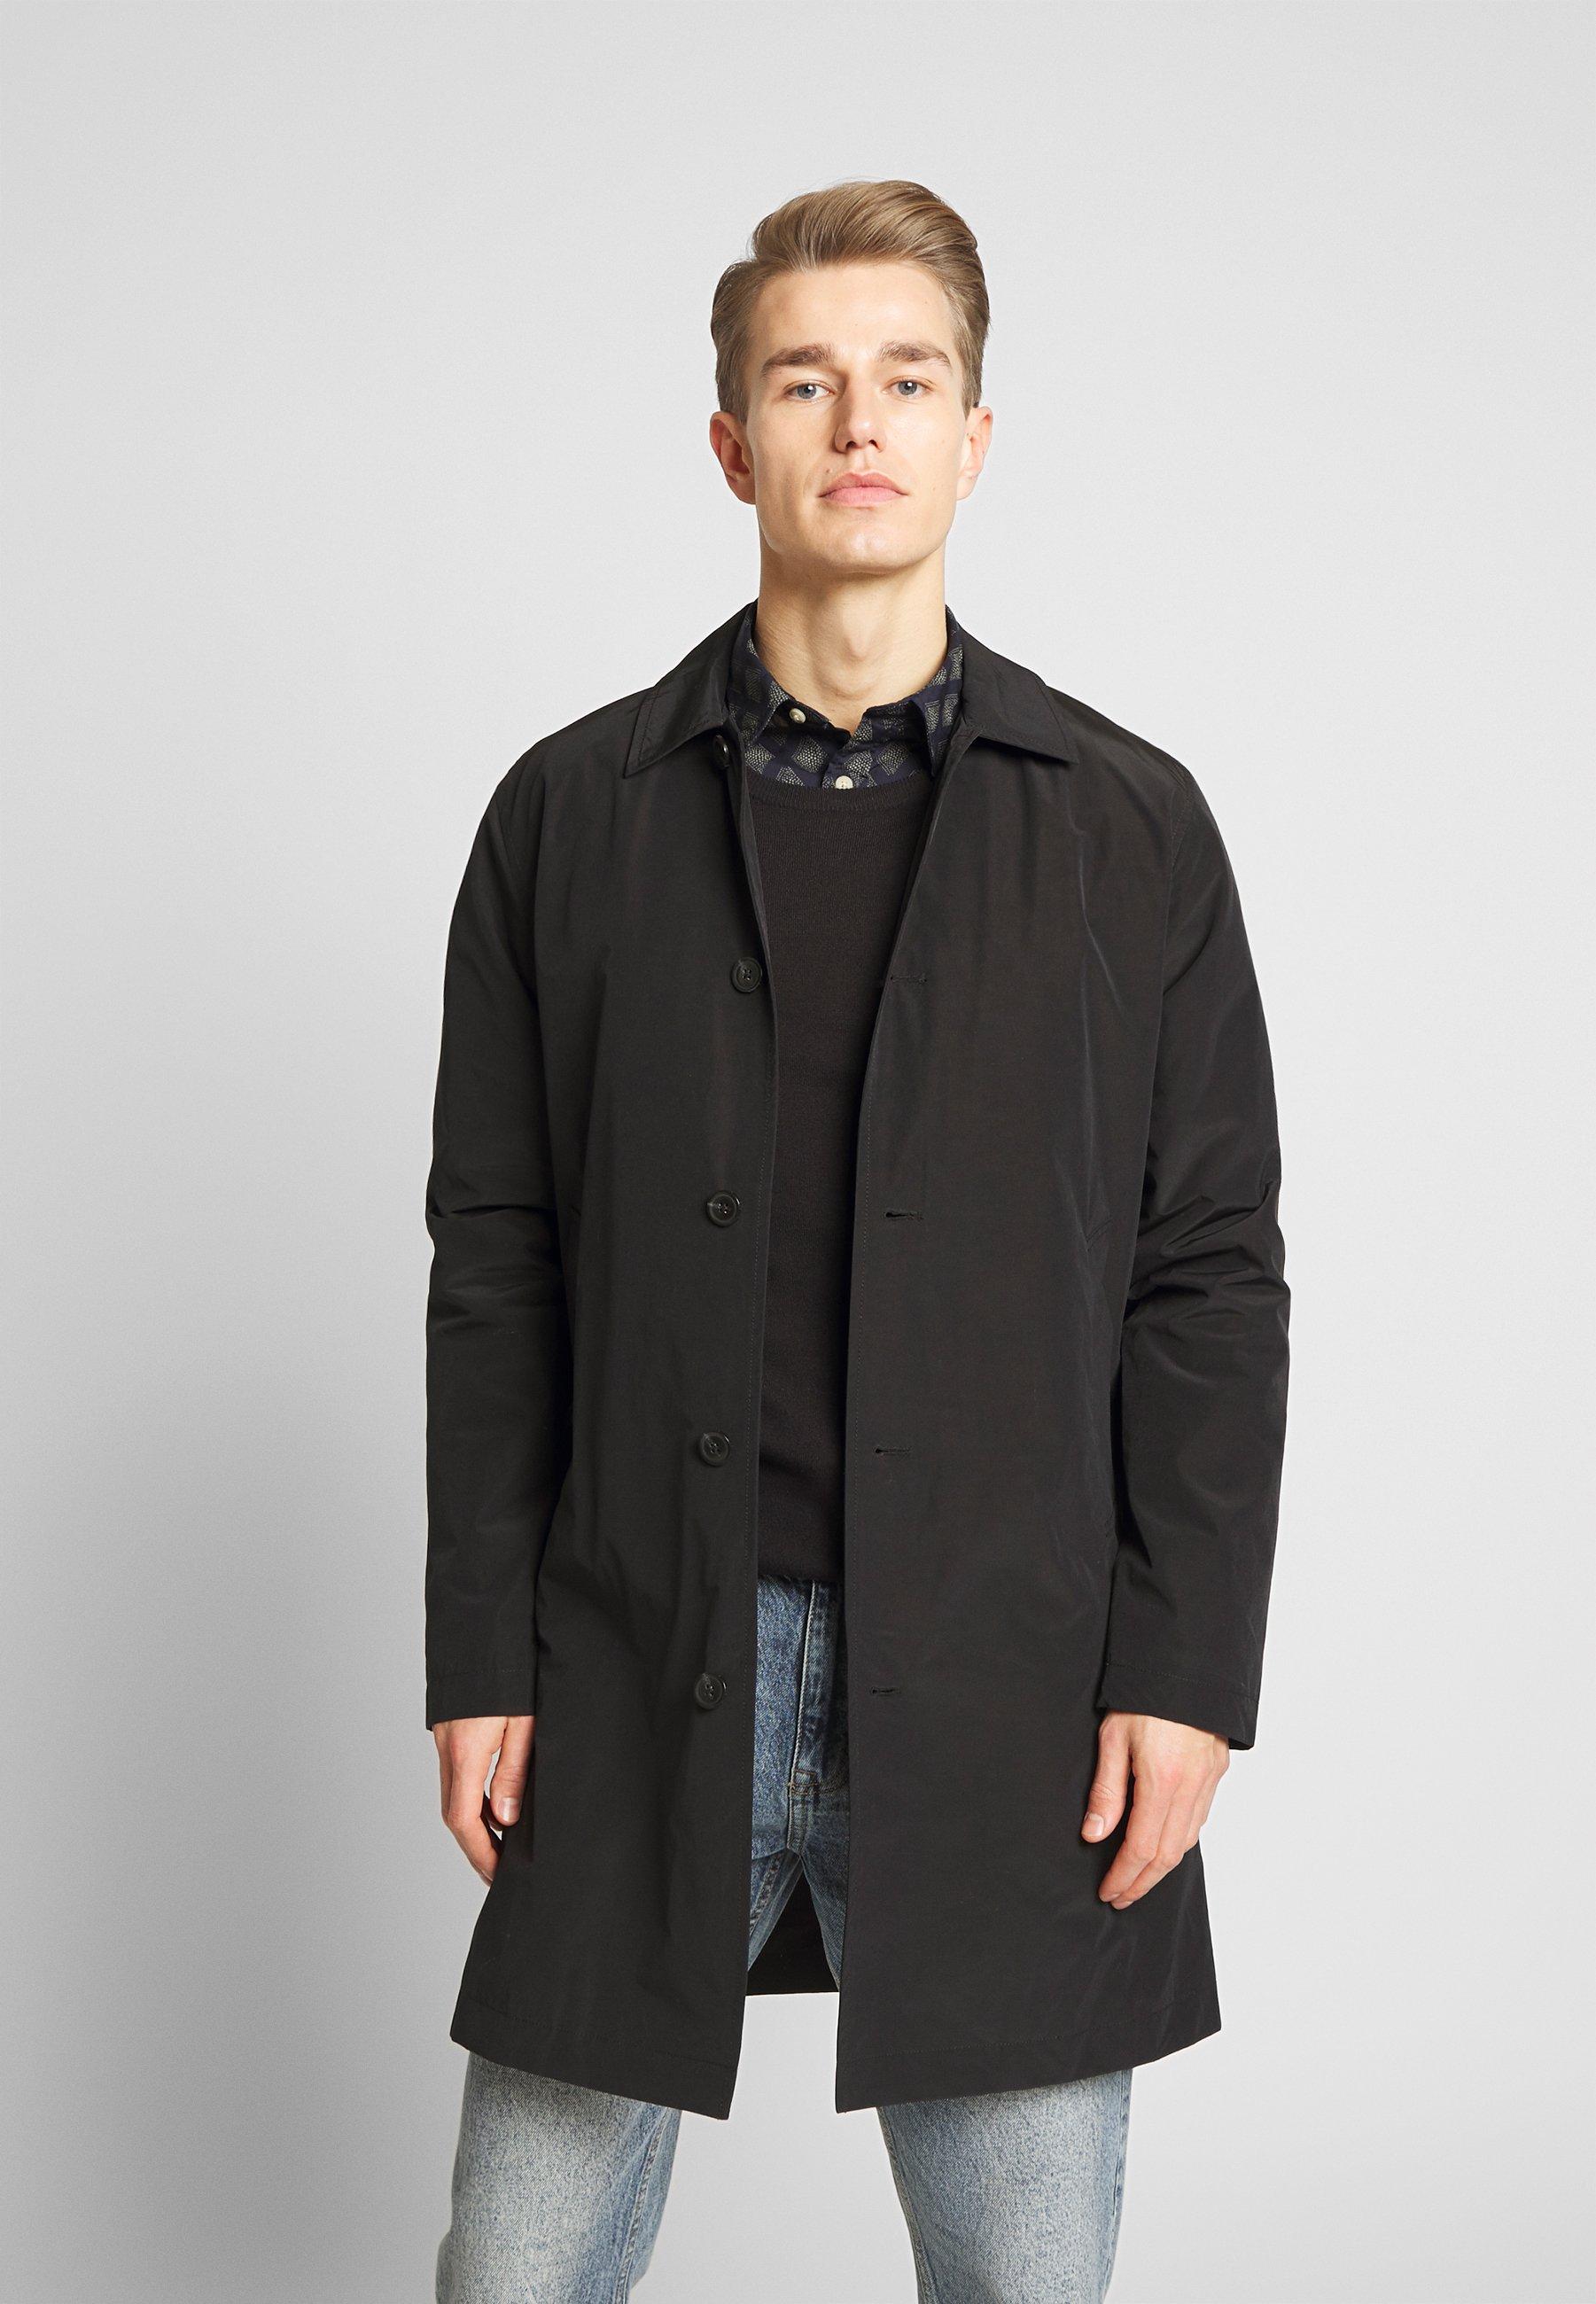 Più votati Abbigliamento da uomo Samsøe Samsøe MASSA COAT Cappotto corto black